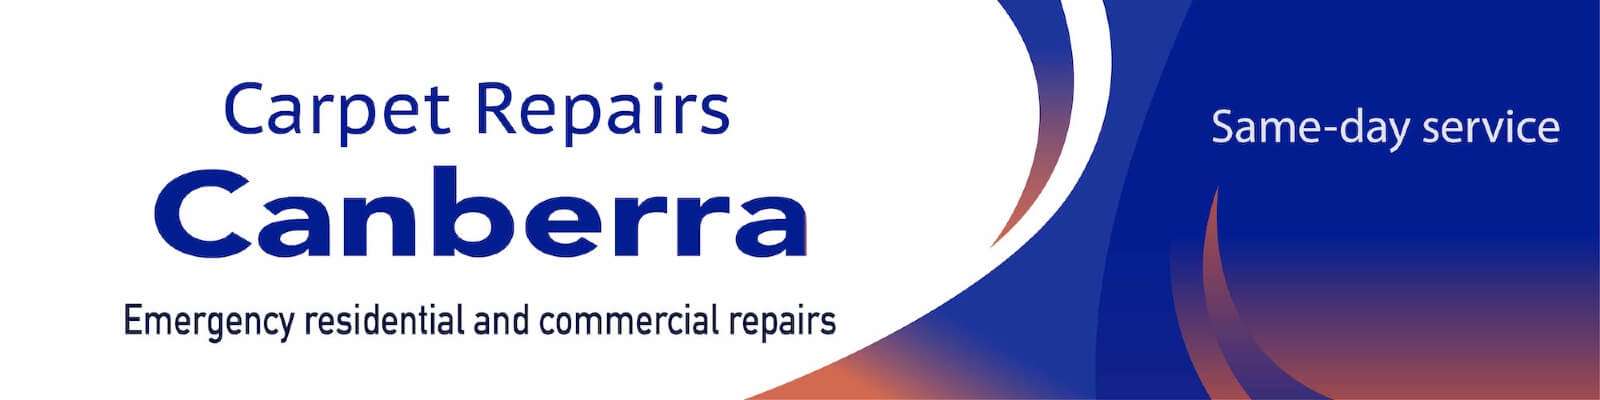 Carpet Repairs Canberra Elegant banner